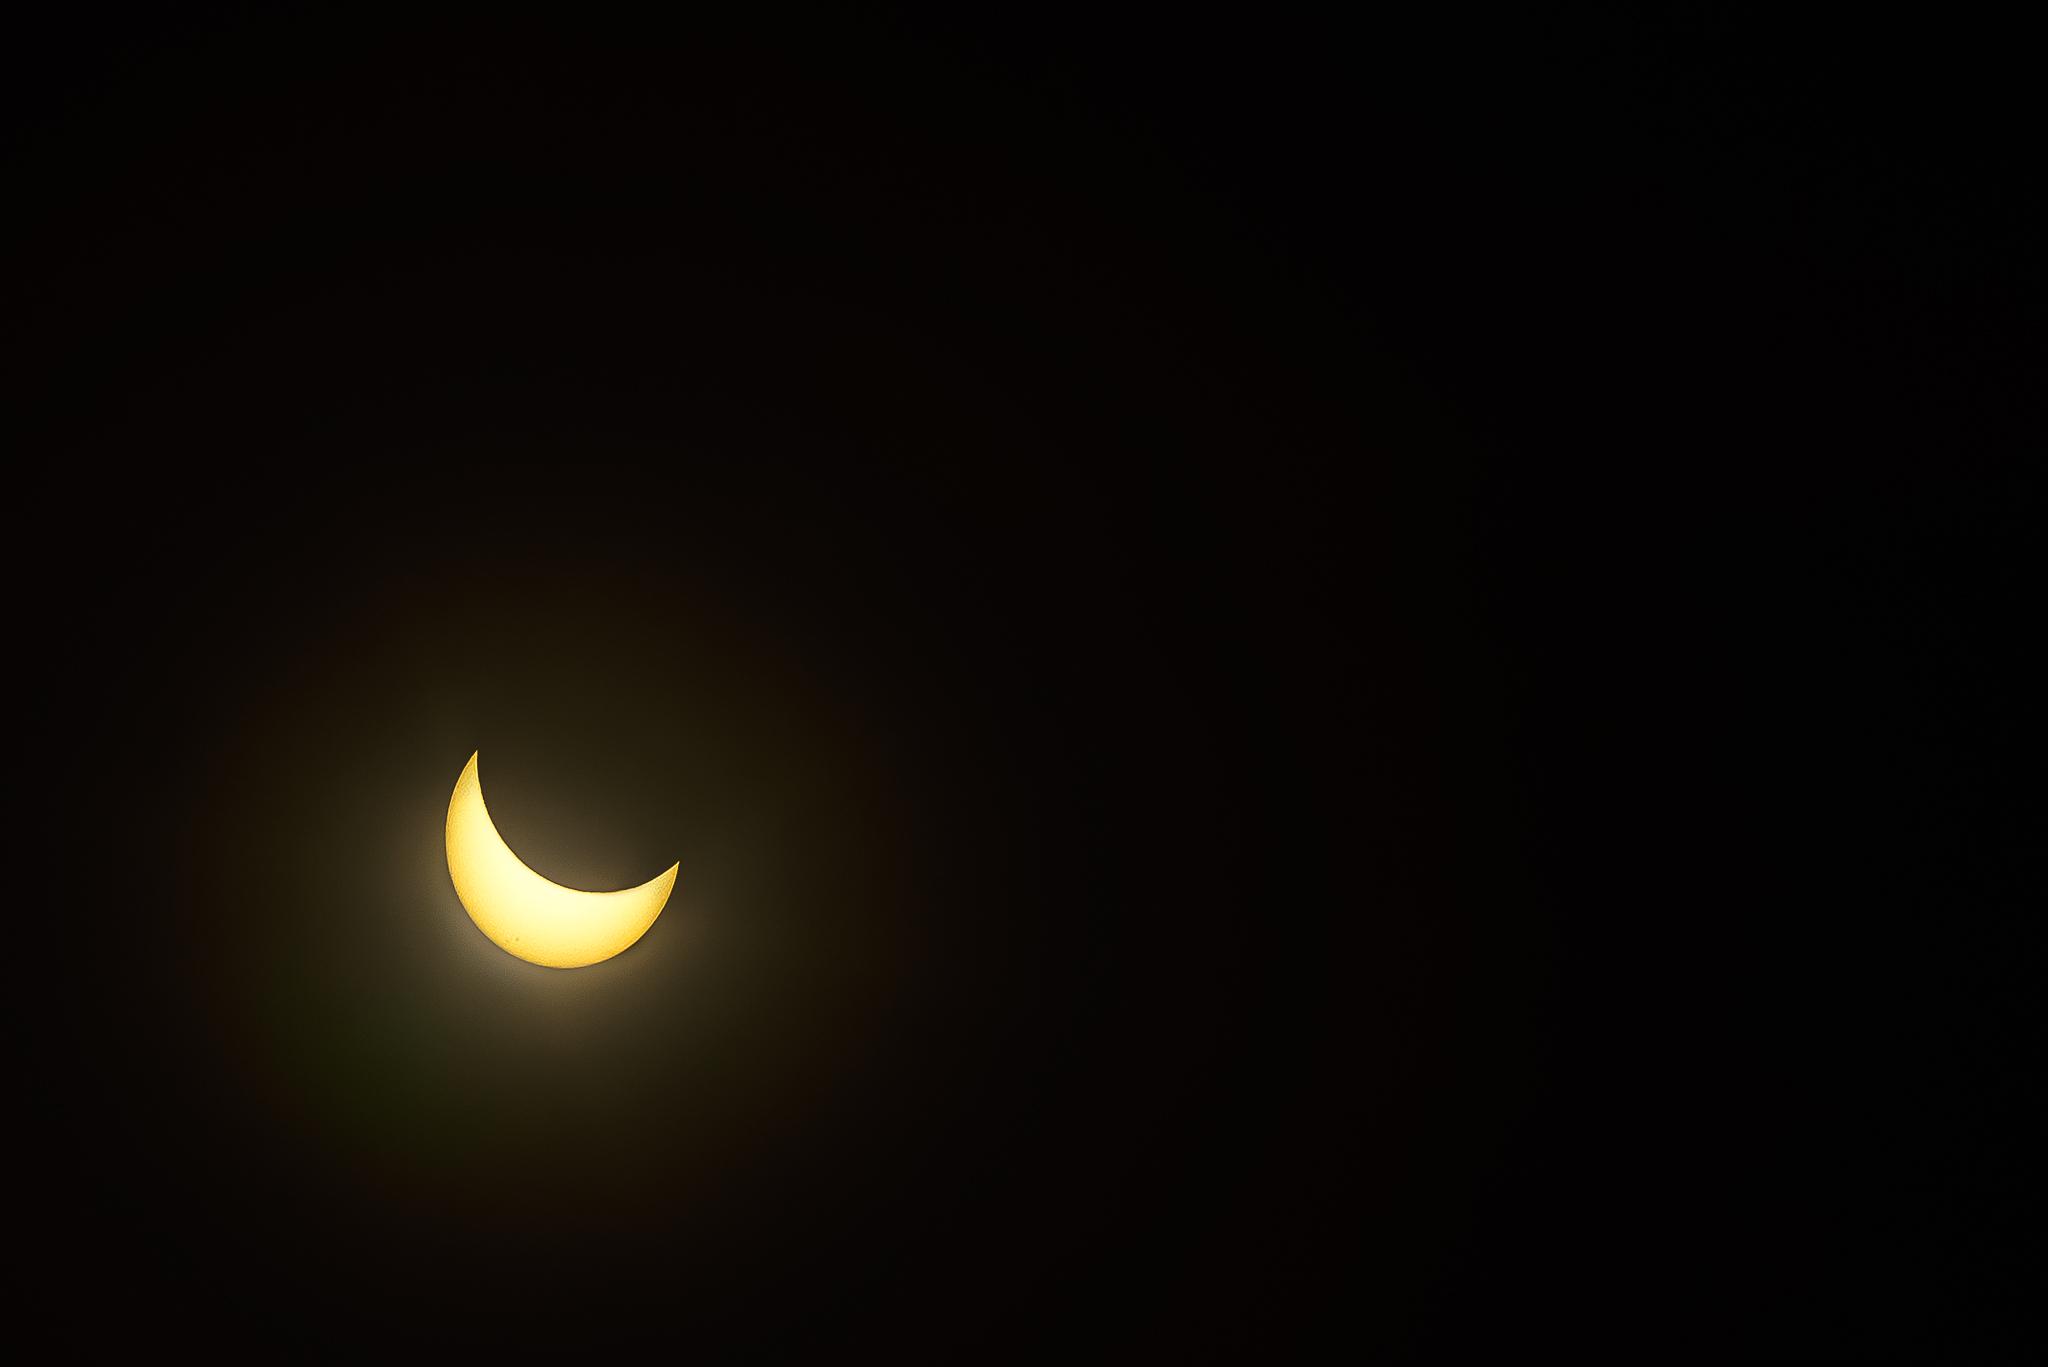 global_eclipse_gathering_quarter_sun_glow